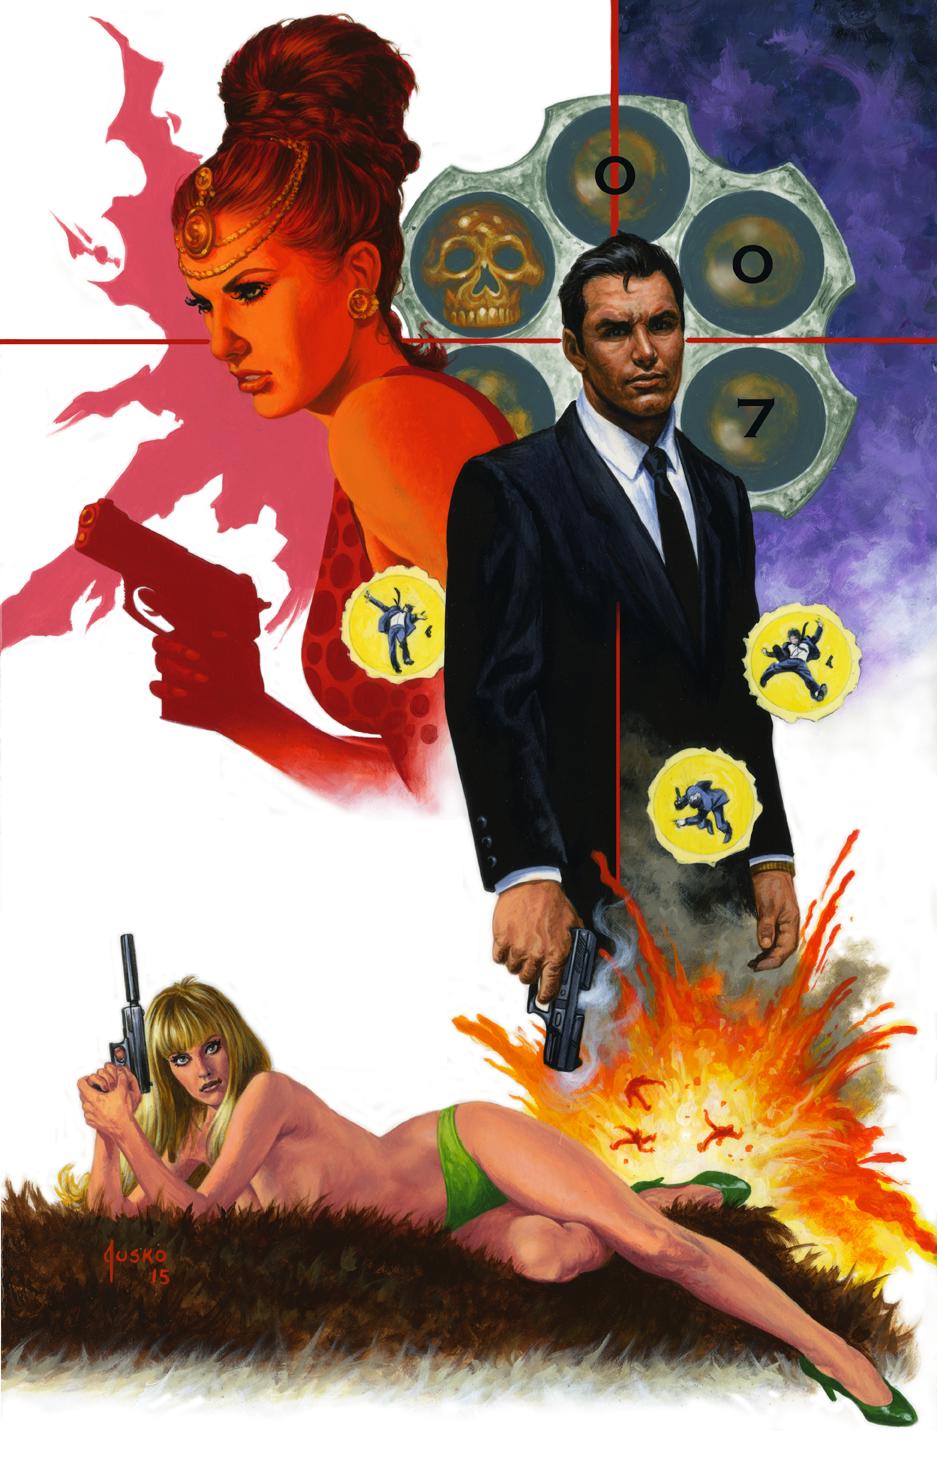 JAMES BOND Store Exclusive Comic Cover